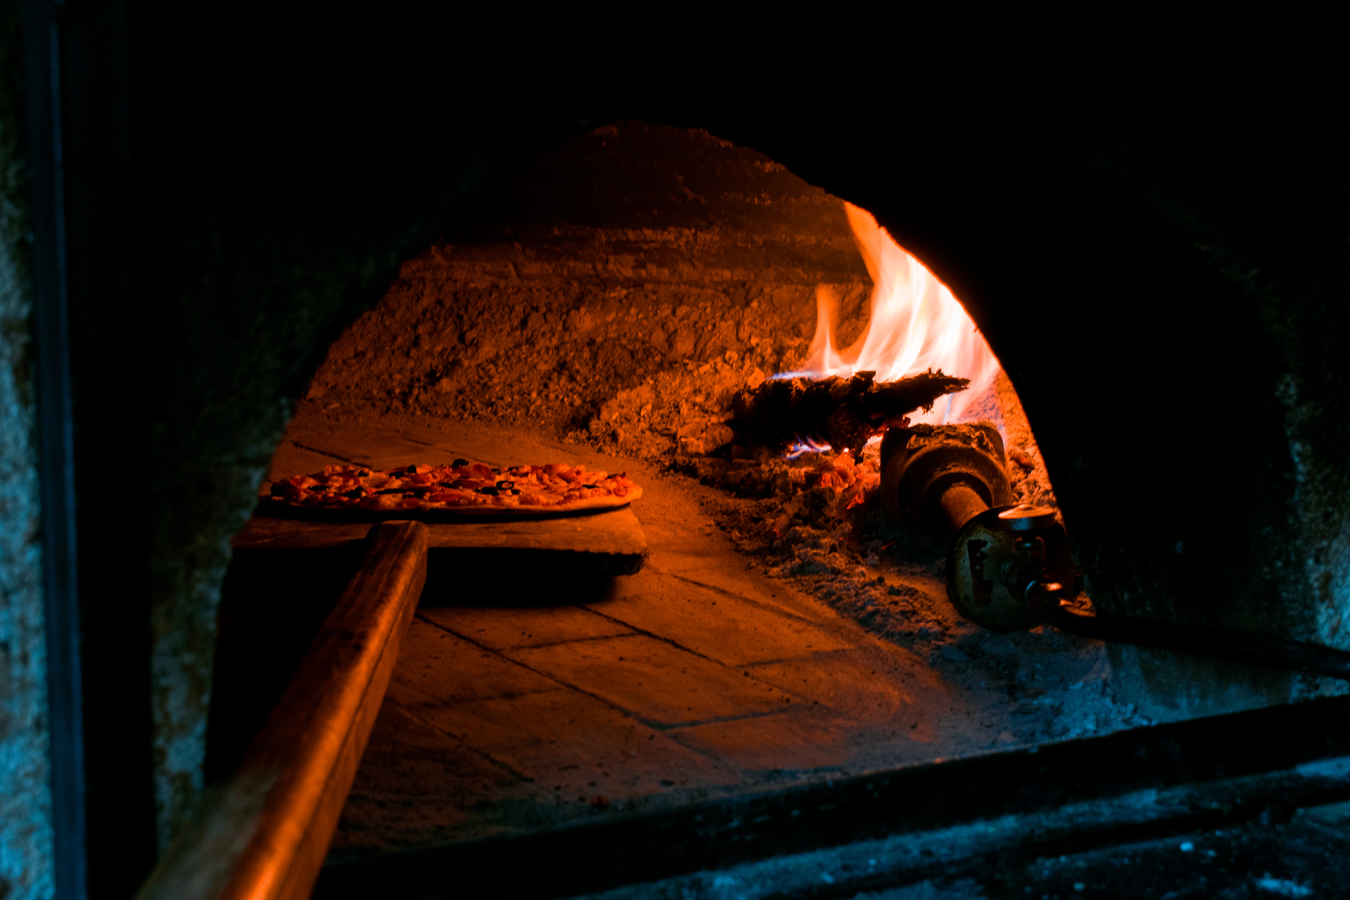 artisan-pizza-food-fire-heat-darkness-1425861-pxhere.com.jpg